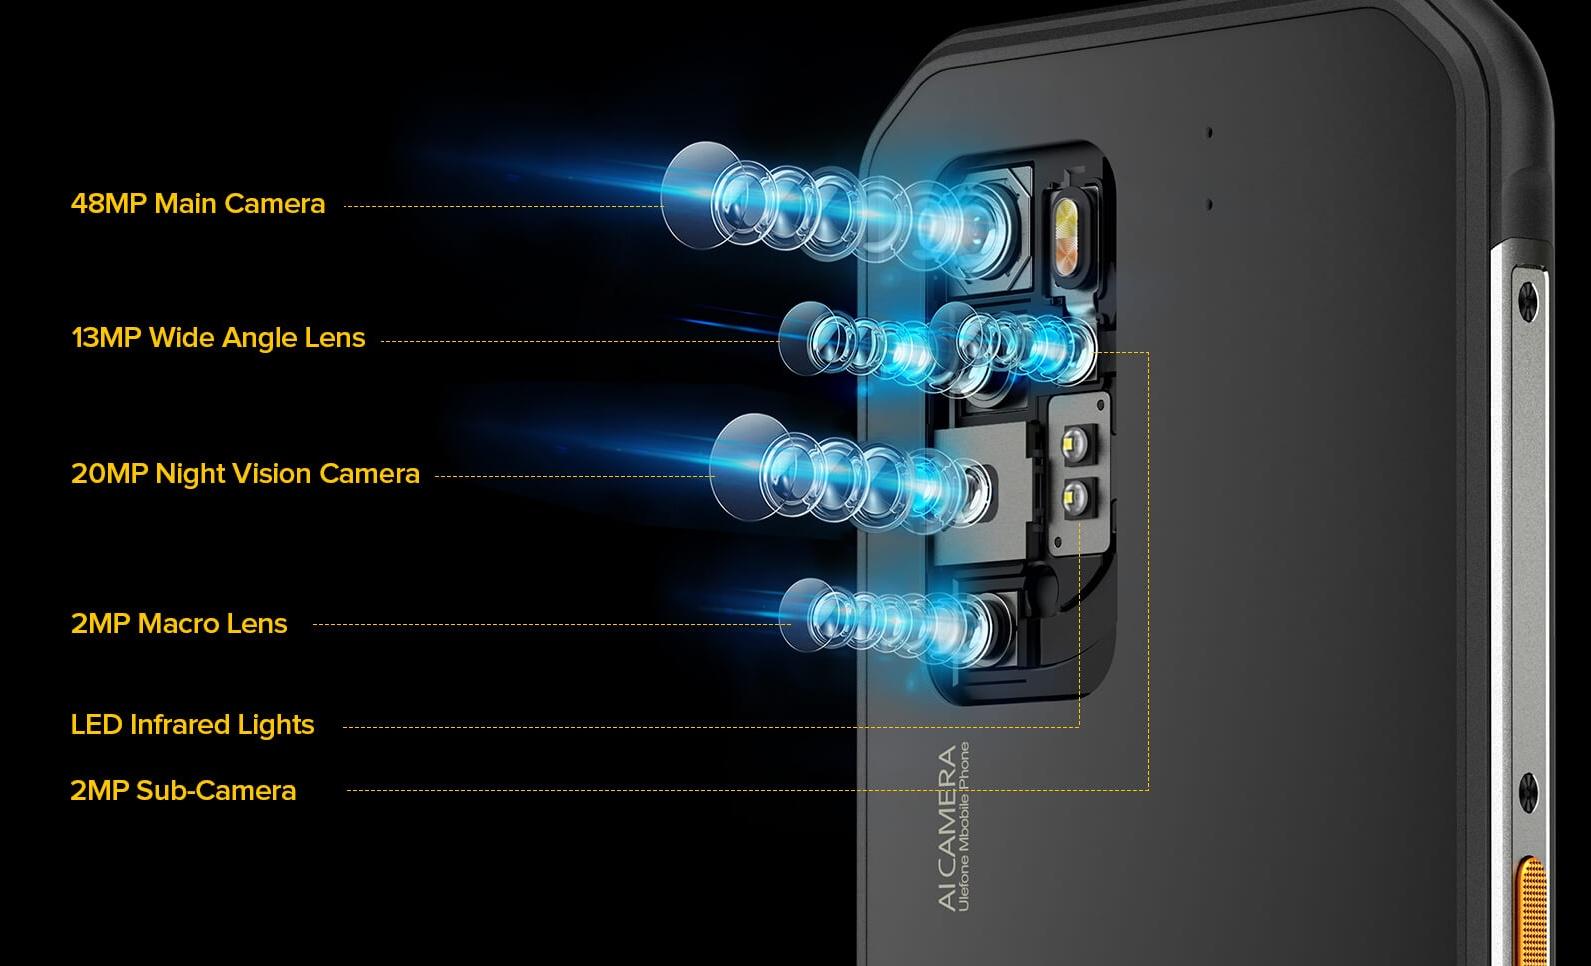 Ulefone Armor 11 - 48MP penta camera